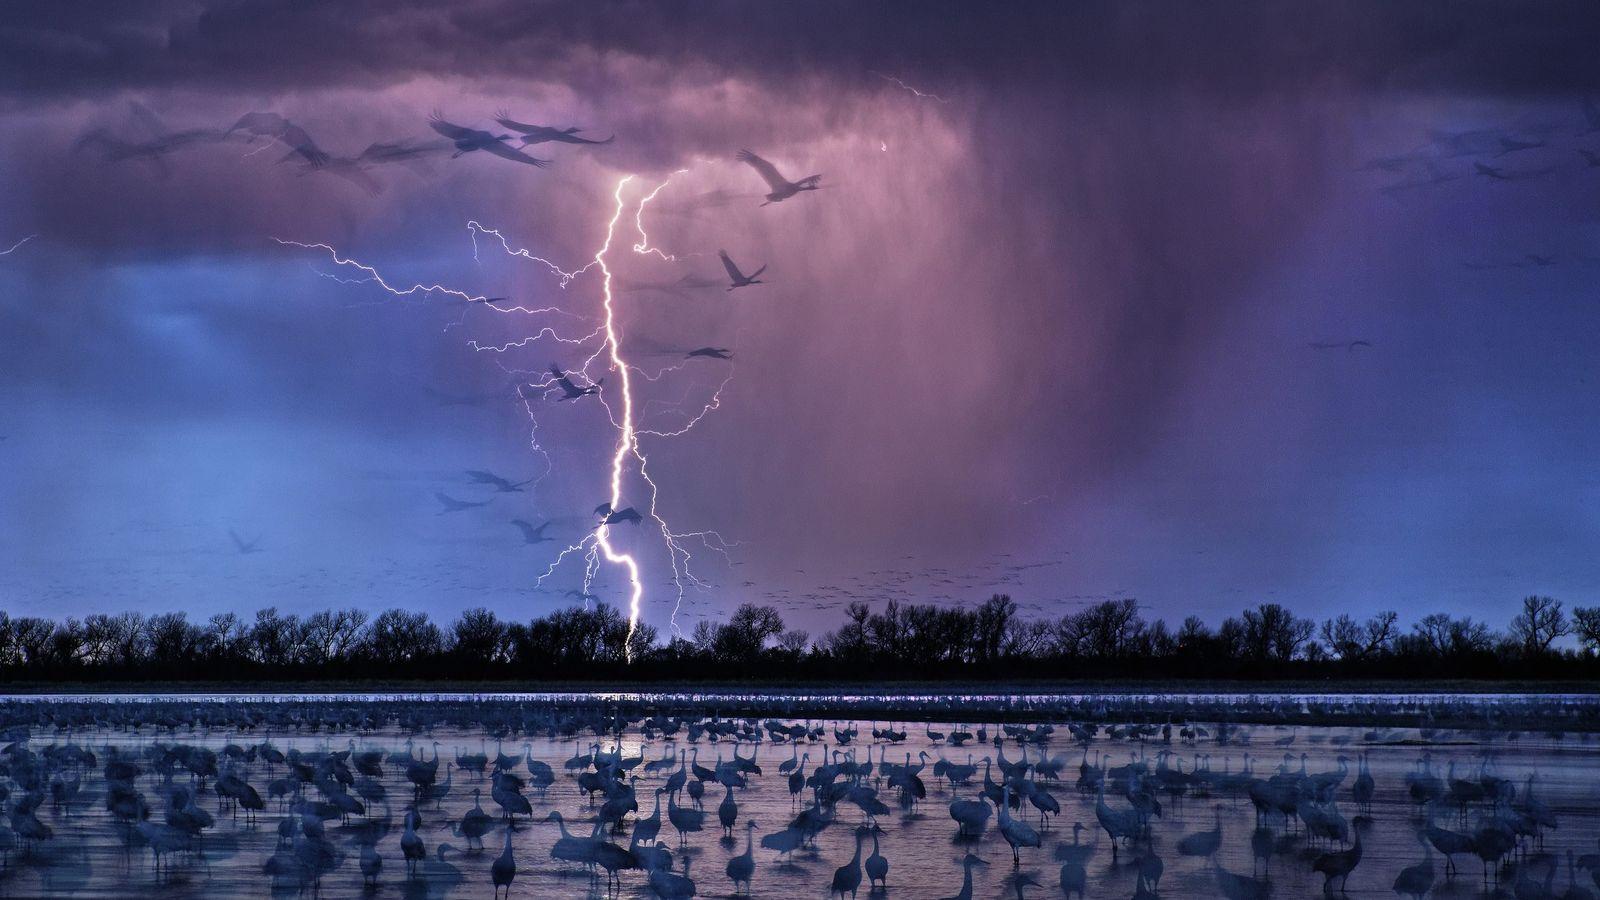 01_epic_summer_storms_lightning